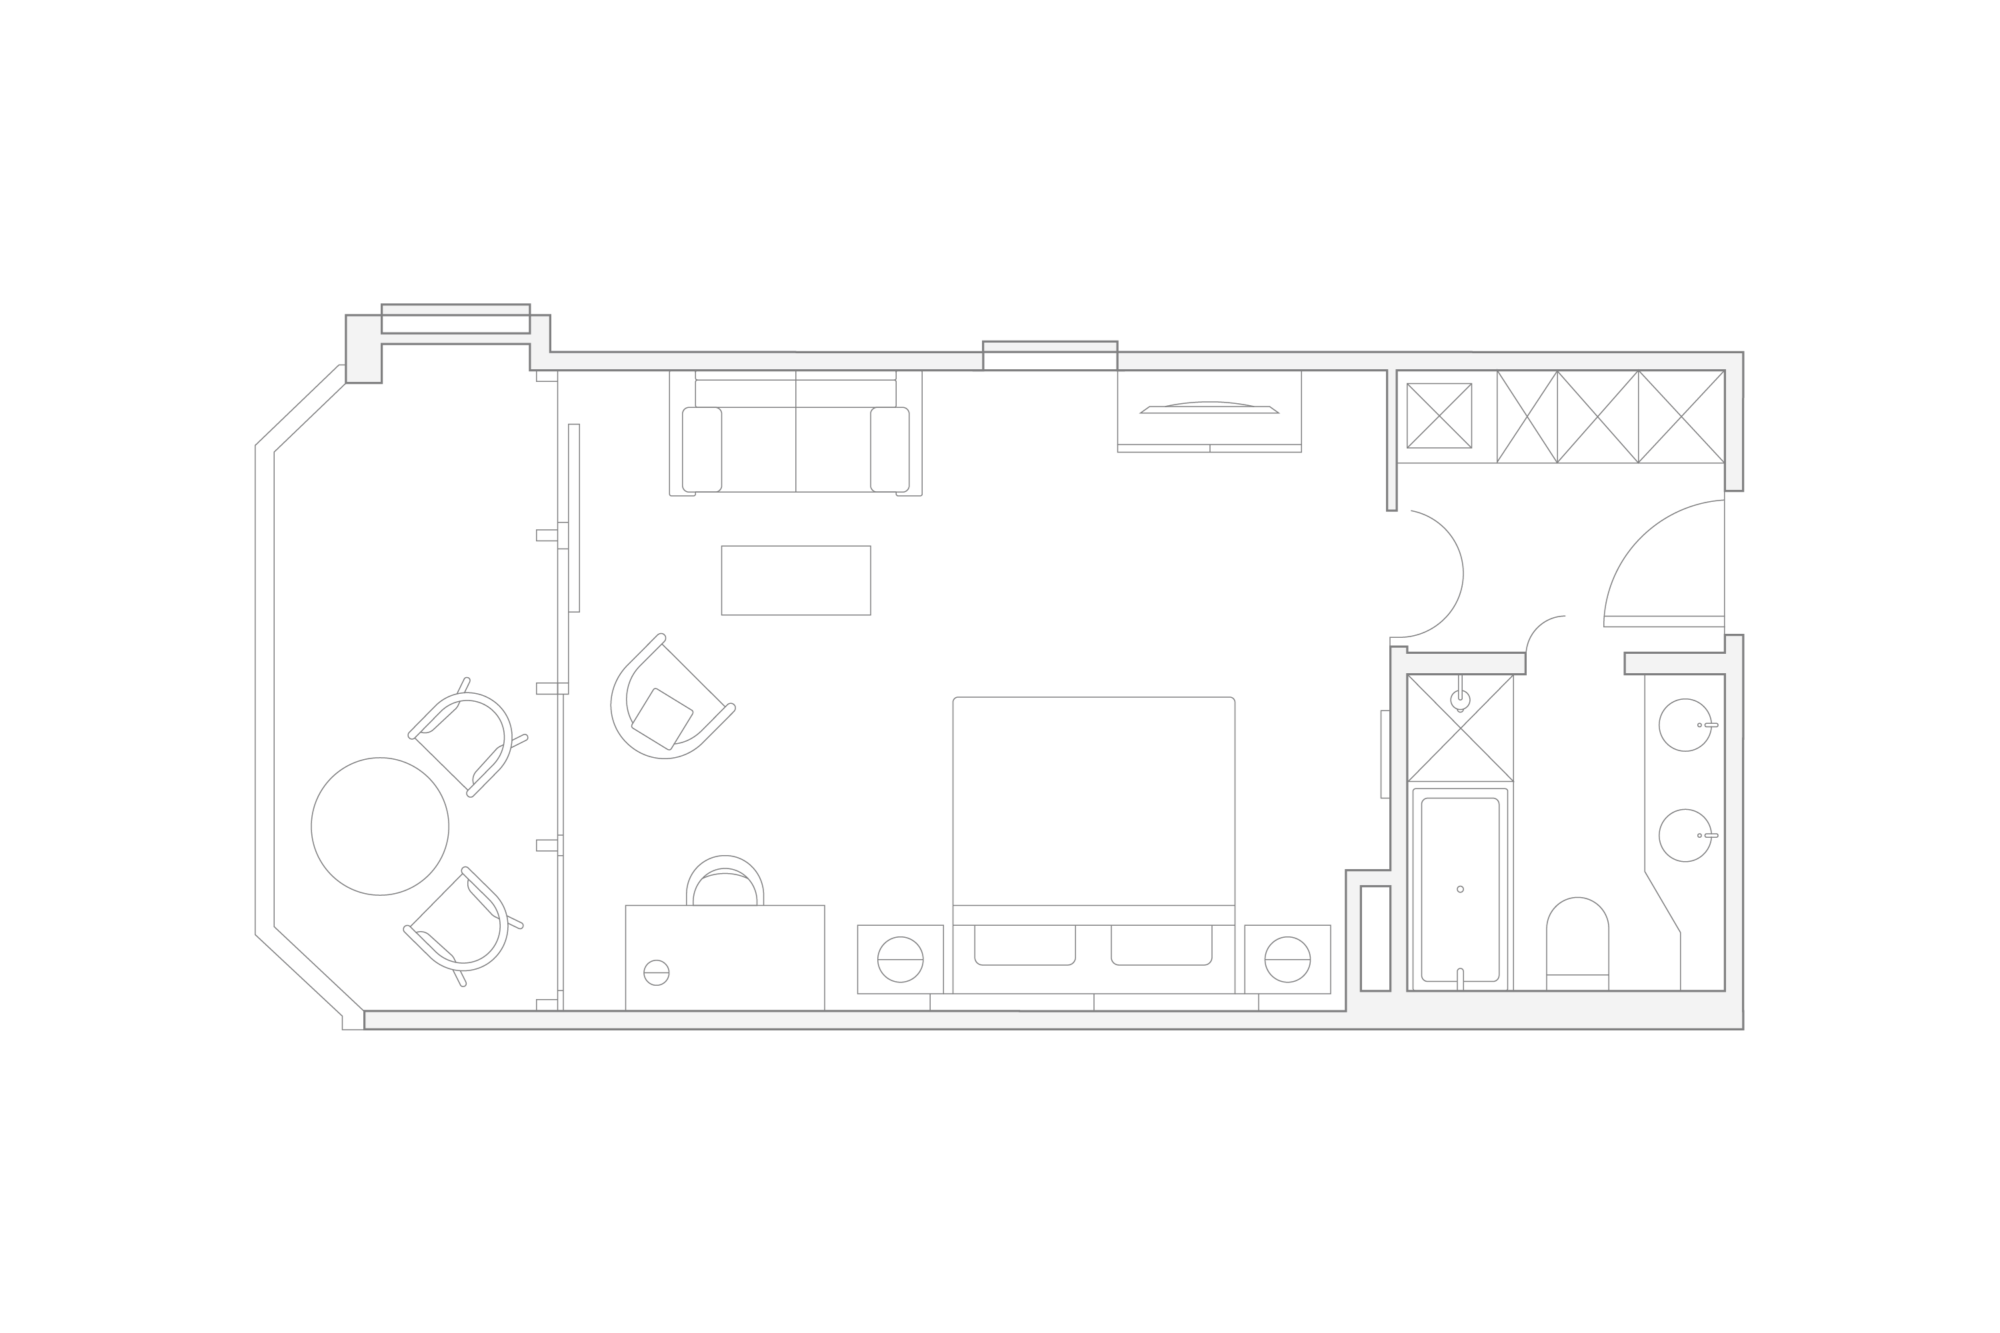 illustrated floorplan of the chalet room